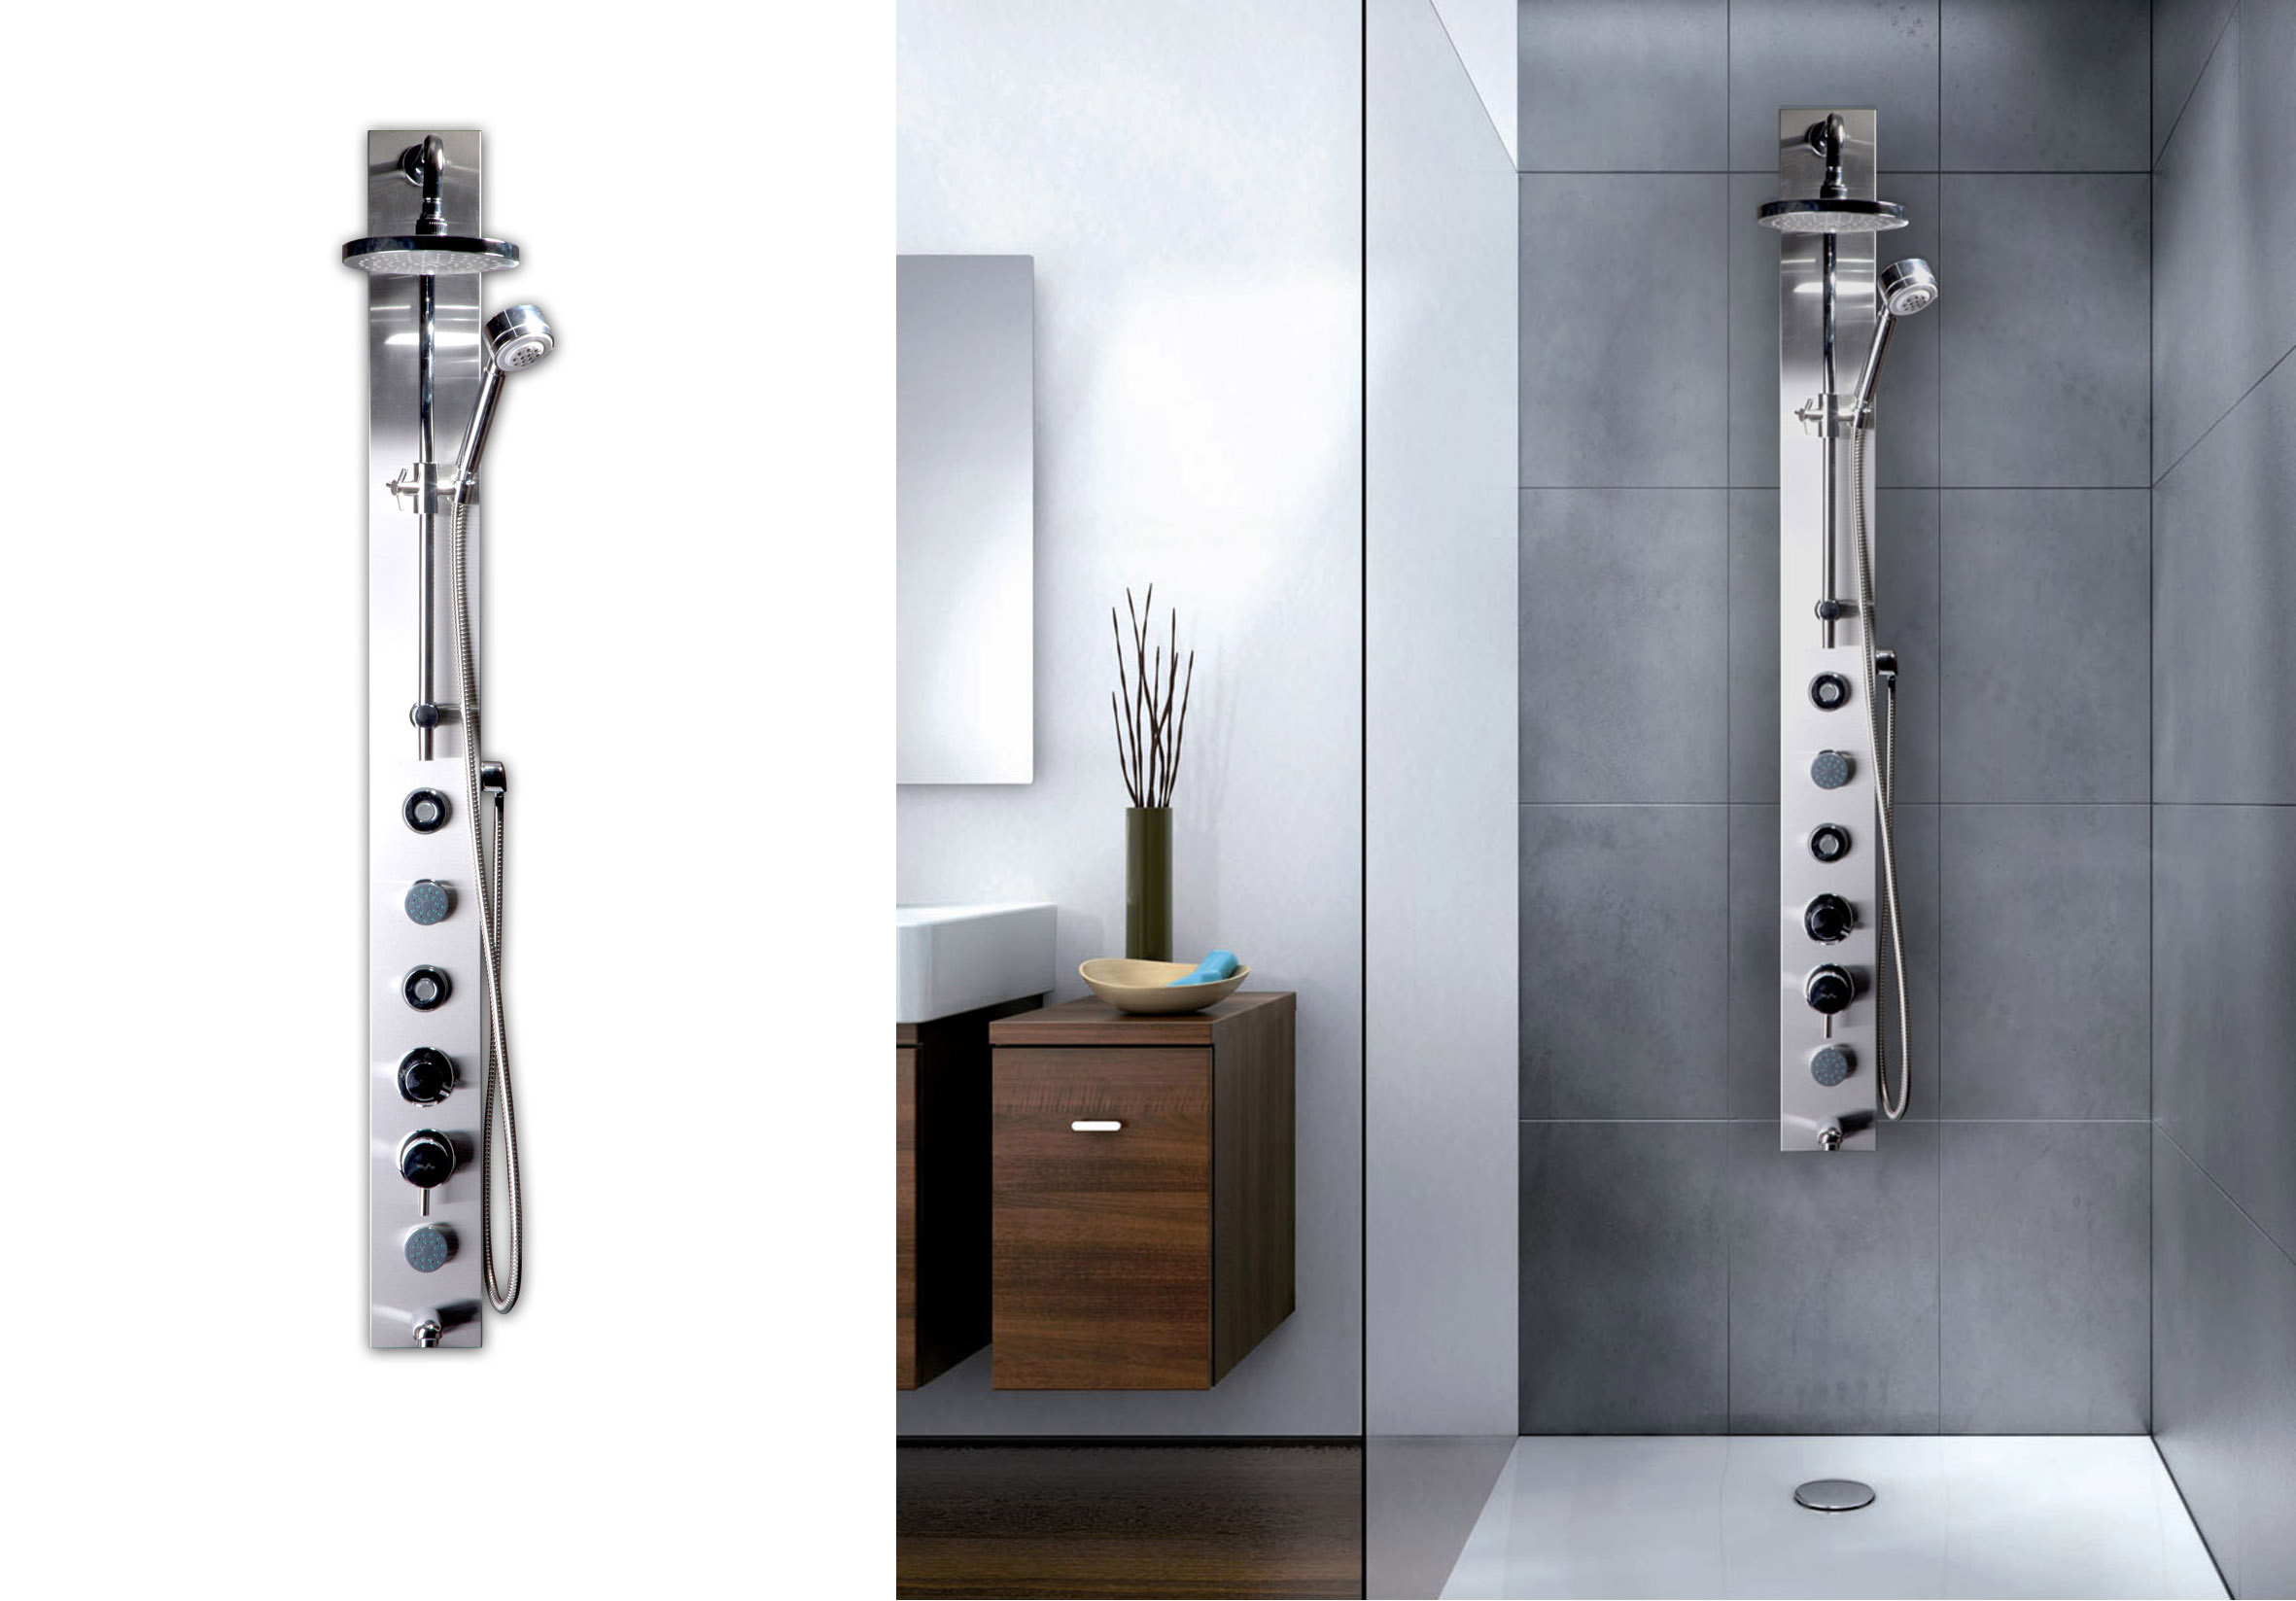 Columnas de ducha hidromasaje chc roca wasser - Columnas de ducha ...